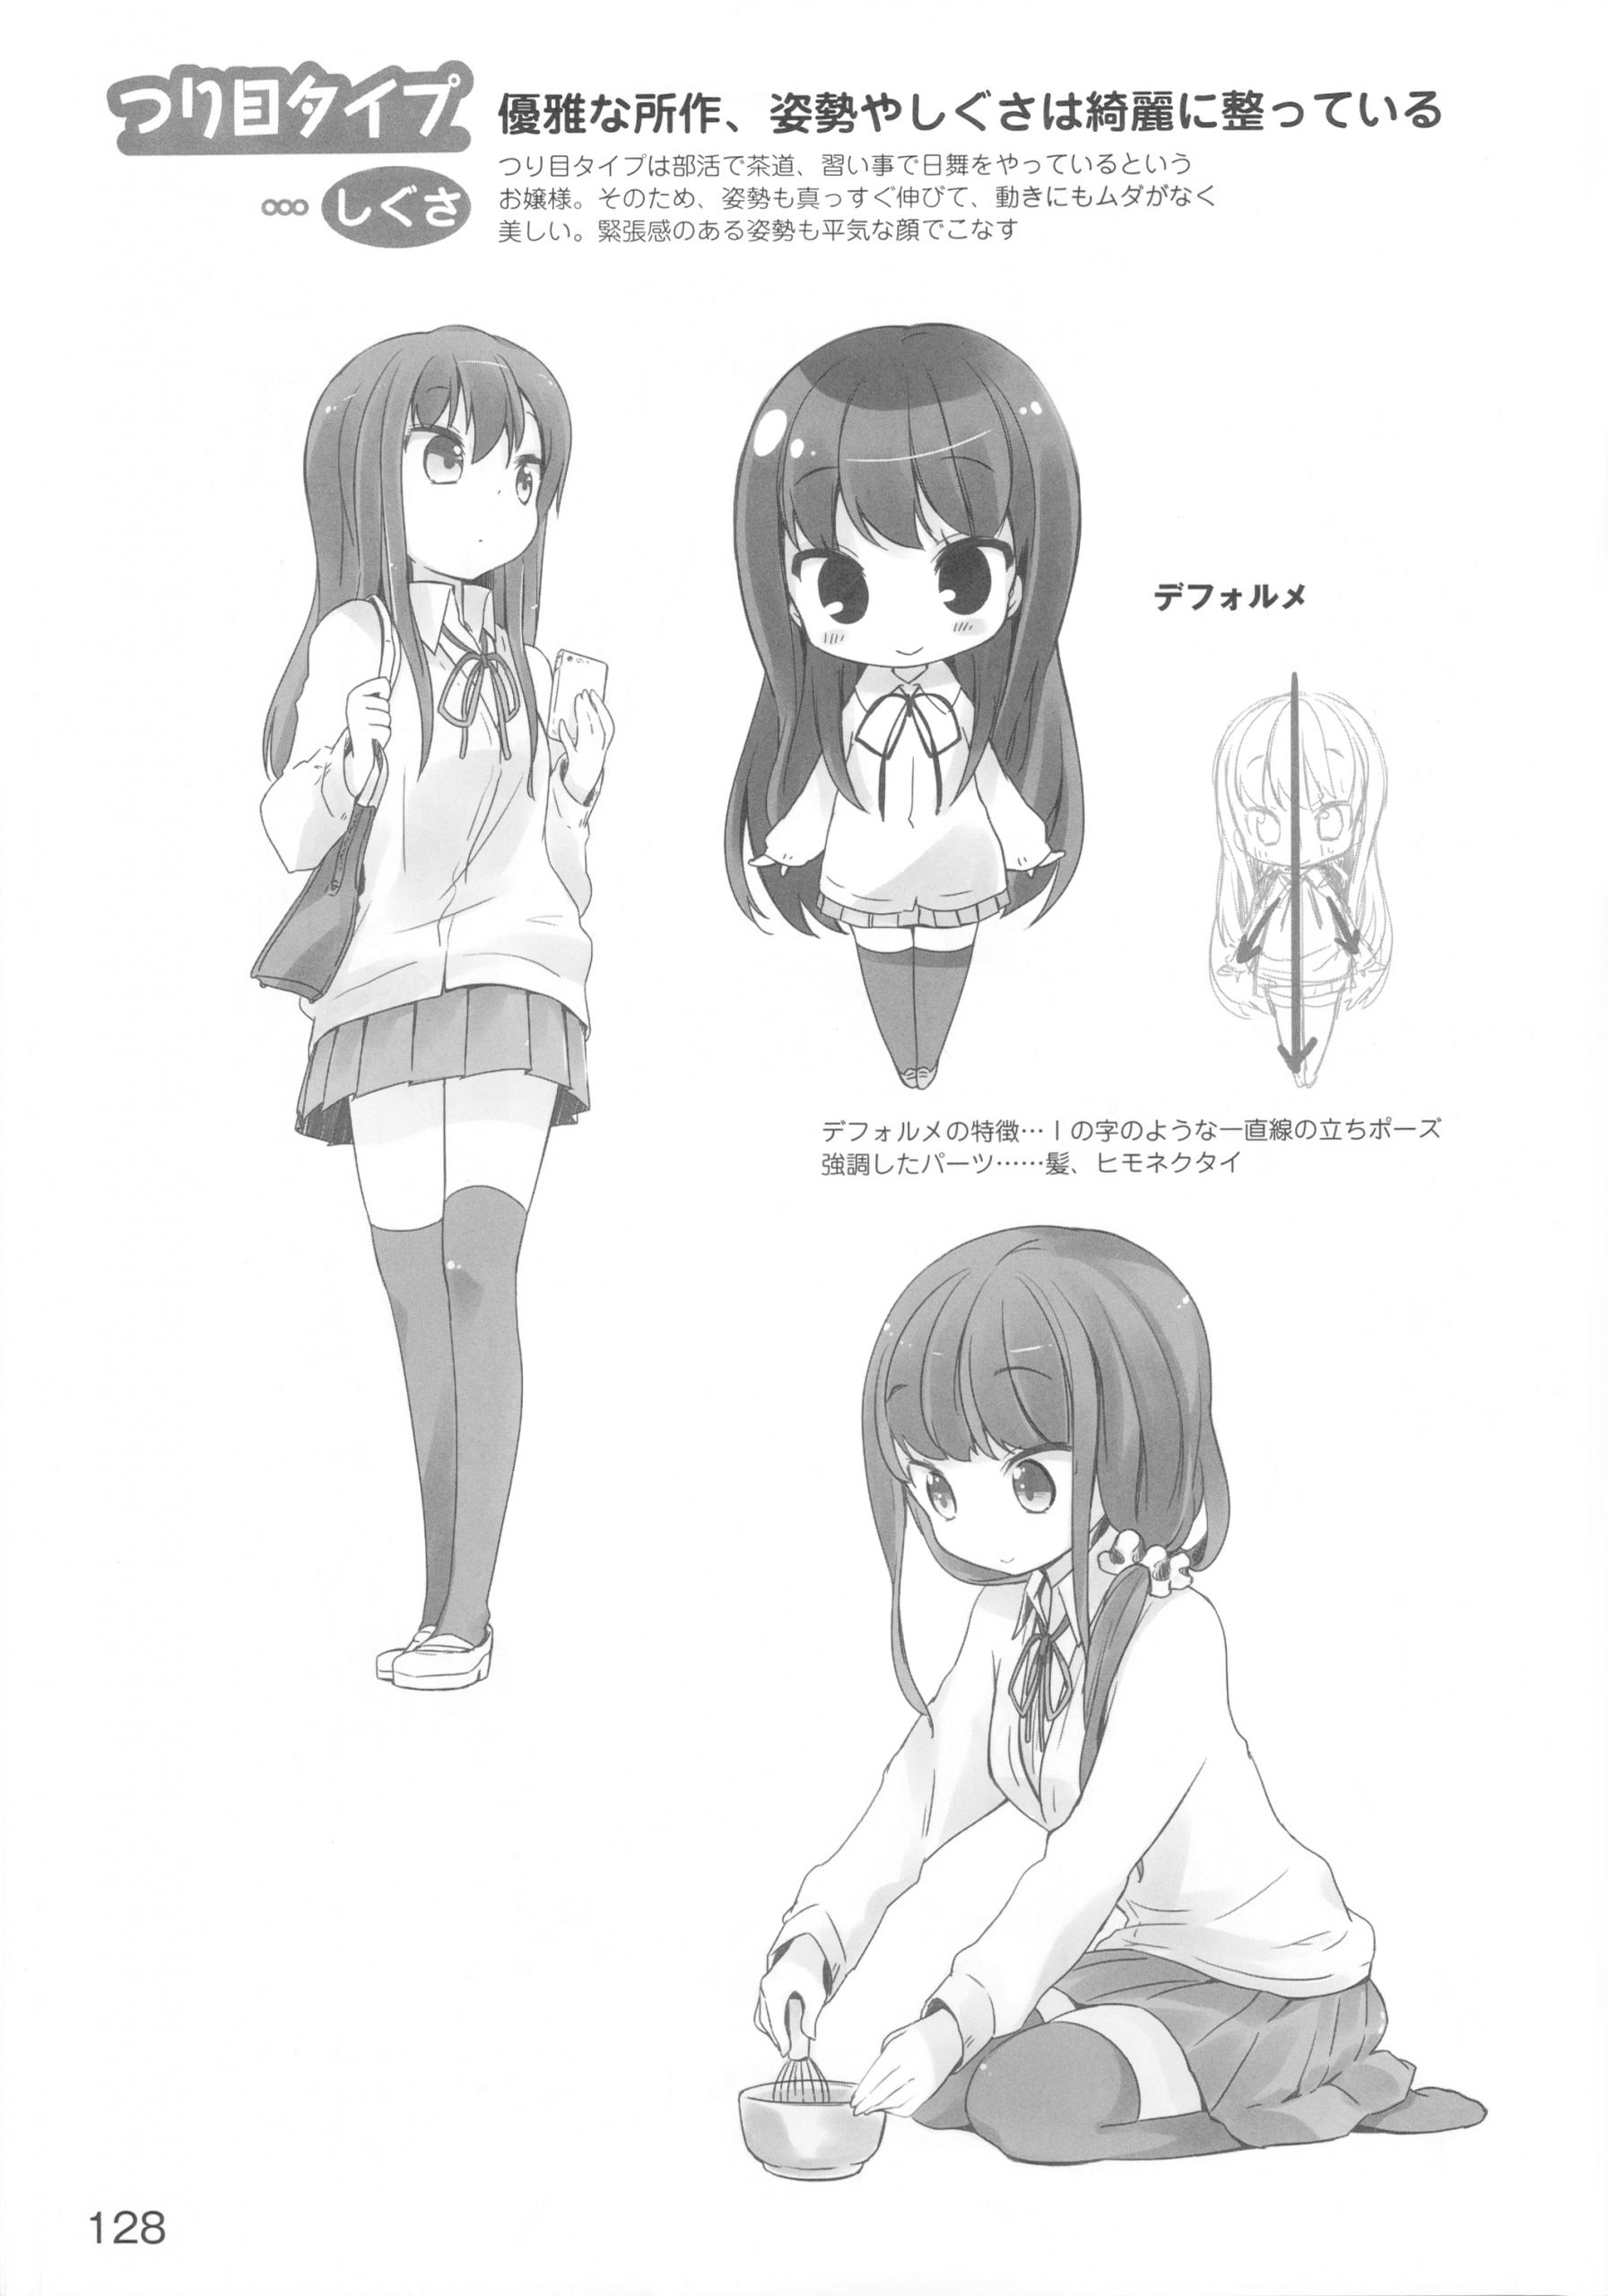 Manga Poses | Wie Zeichnet Man Manga, Zeichenvorlagen Und ganzes Manga Zeichenvorlagen